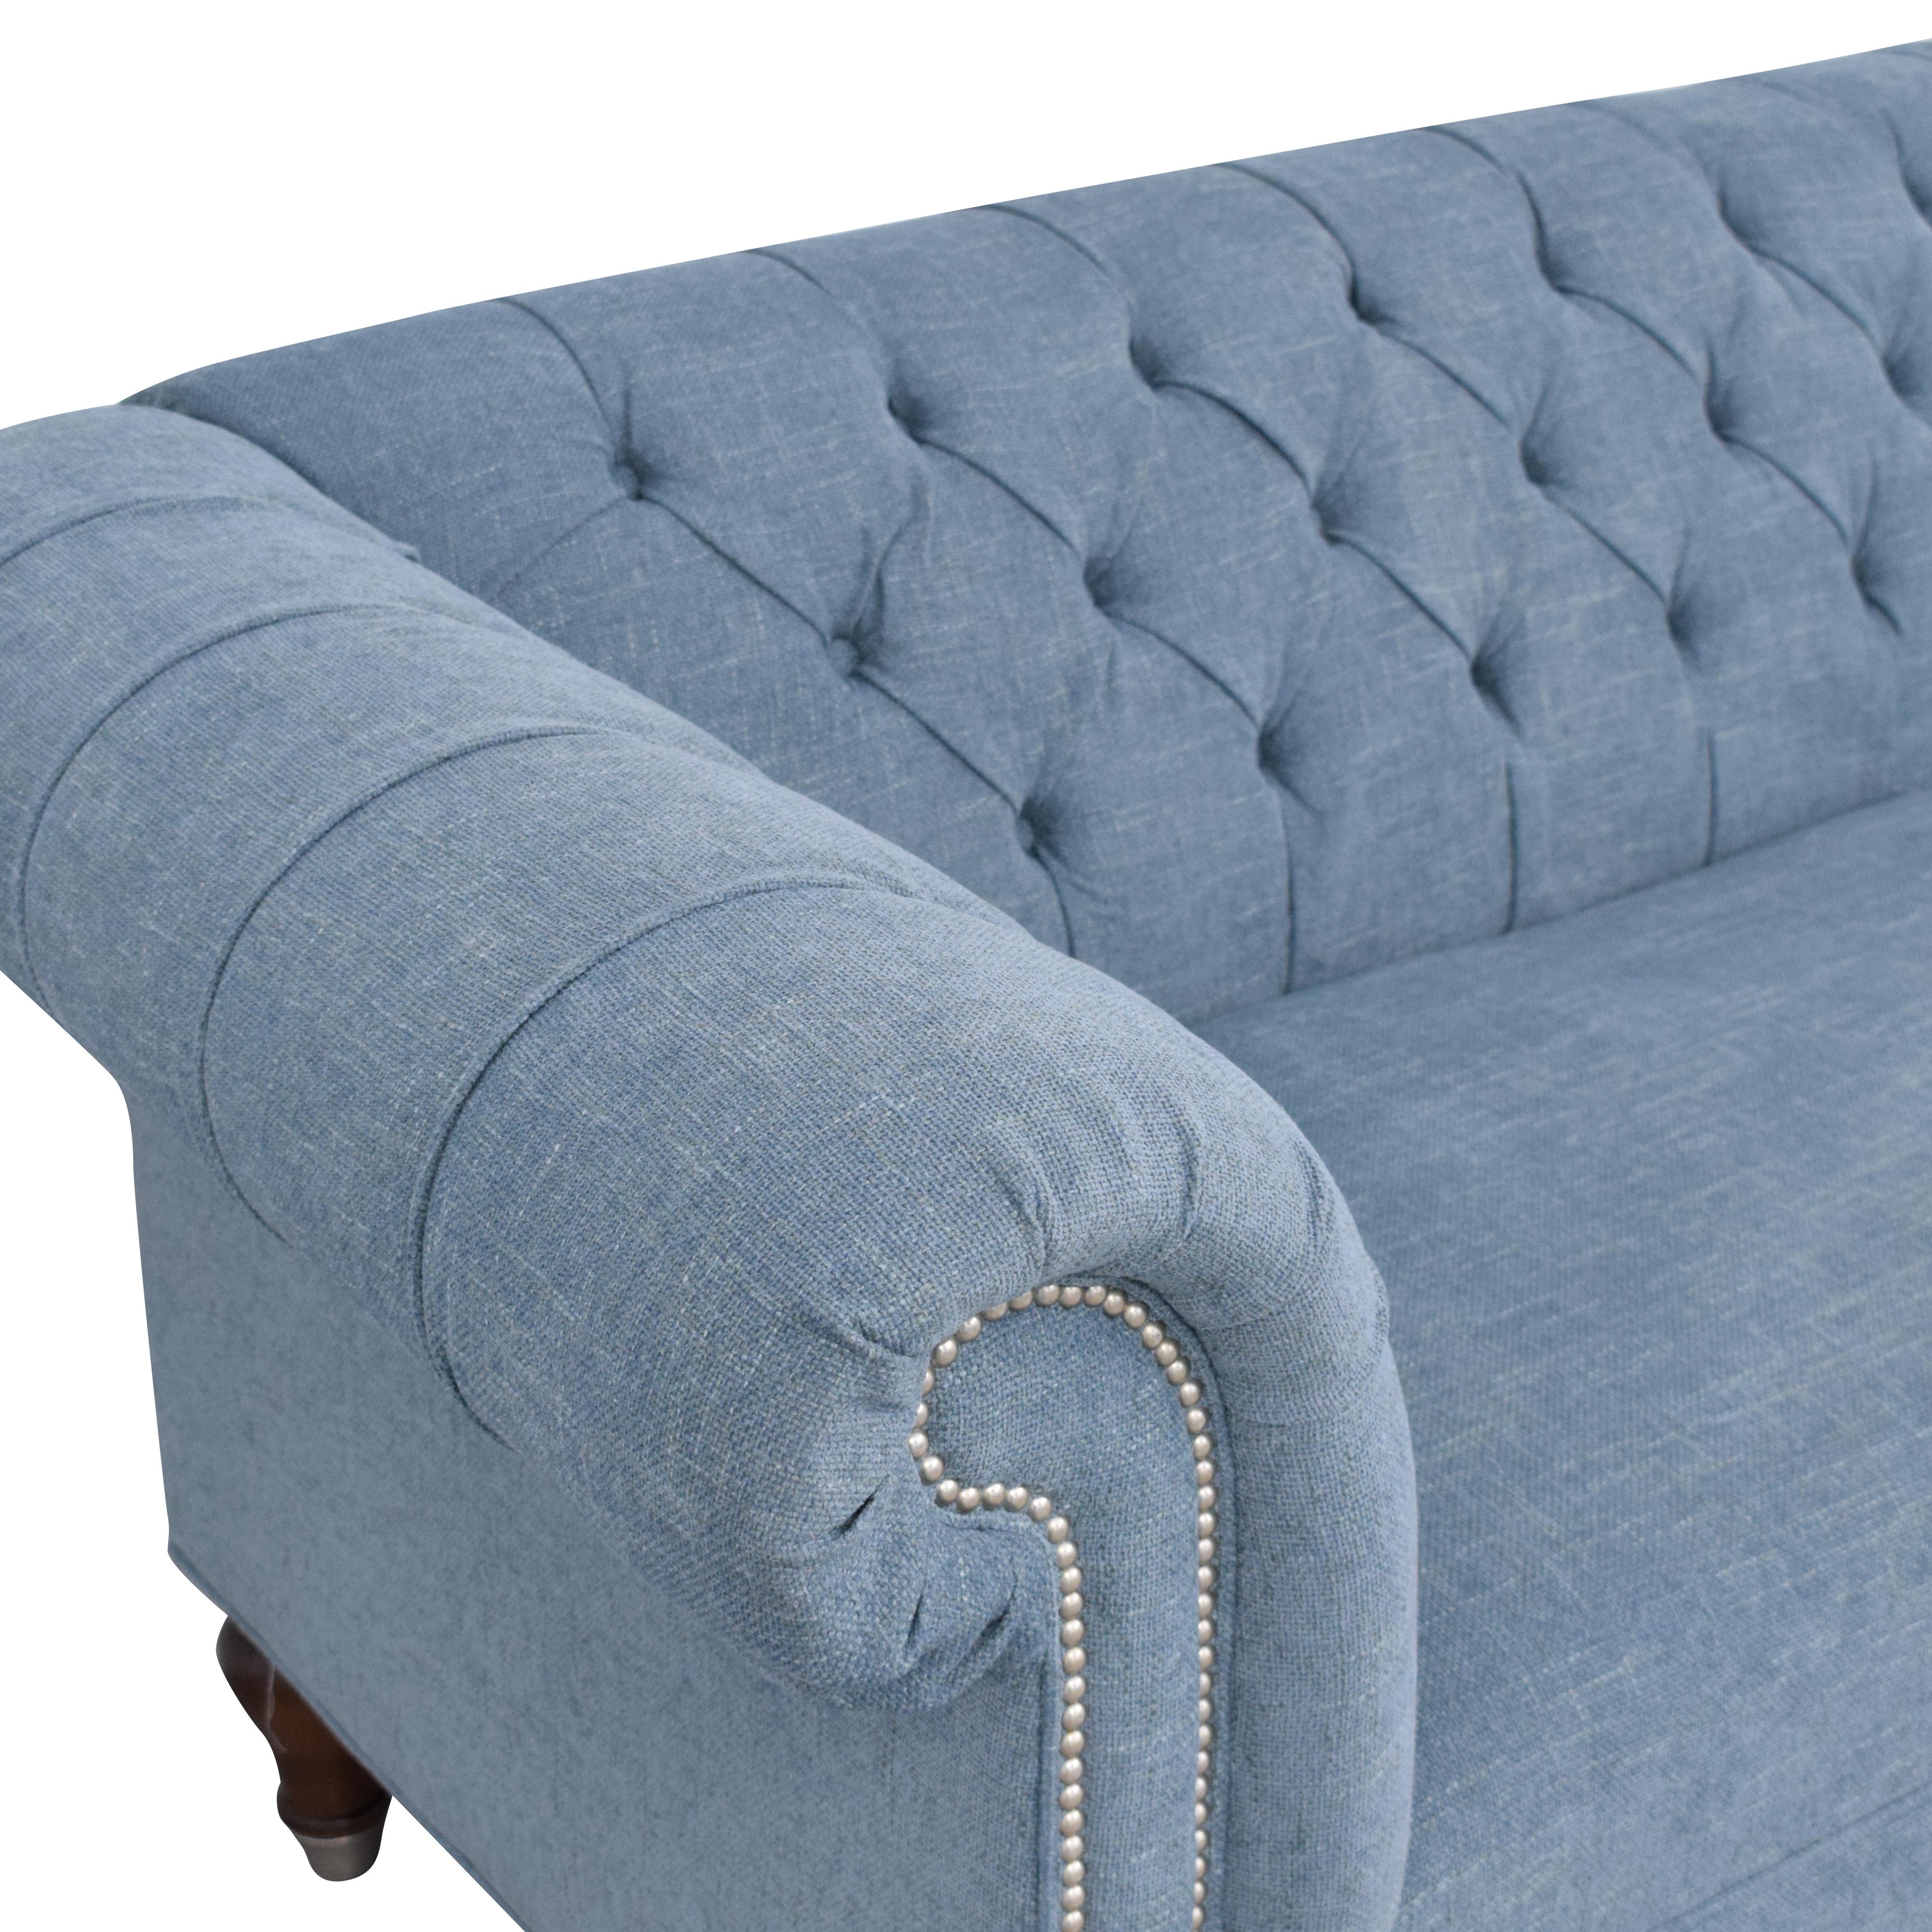 Bassett Furniture Bassett Furniture Chesterfield Sofa used